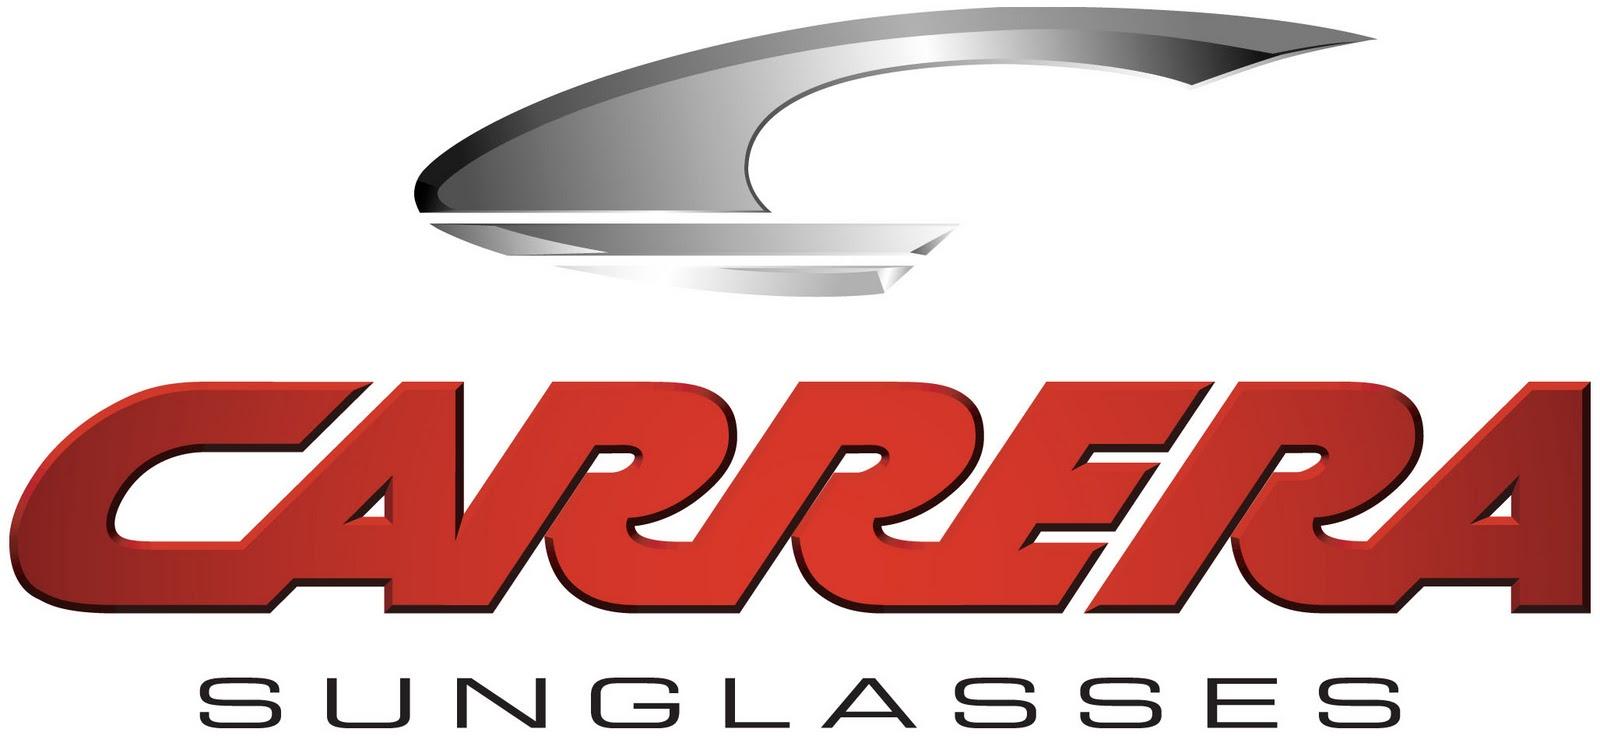 Carrera sunglasses logo